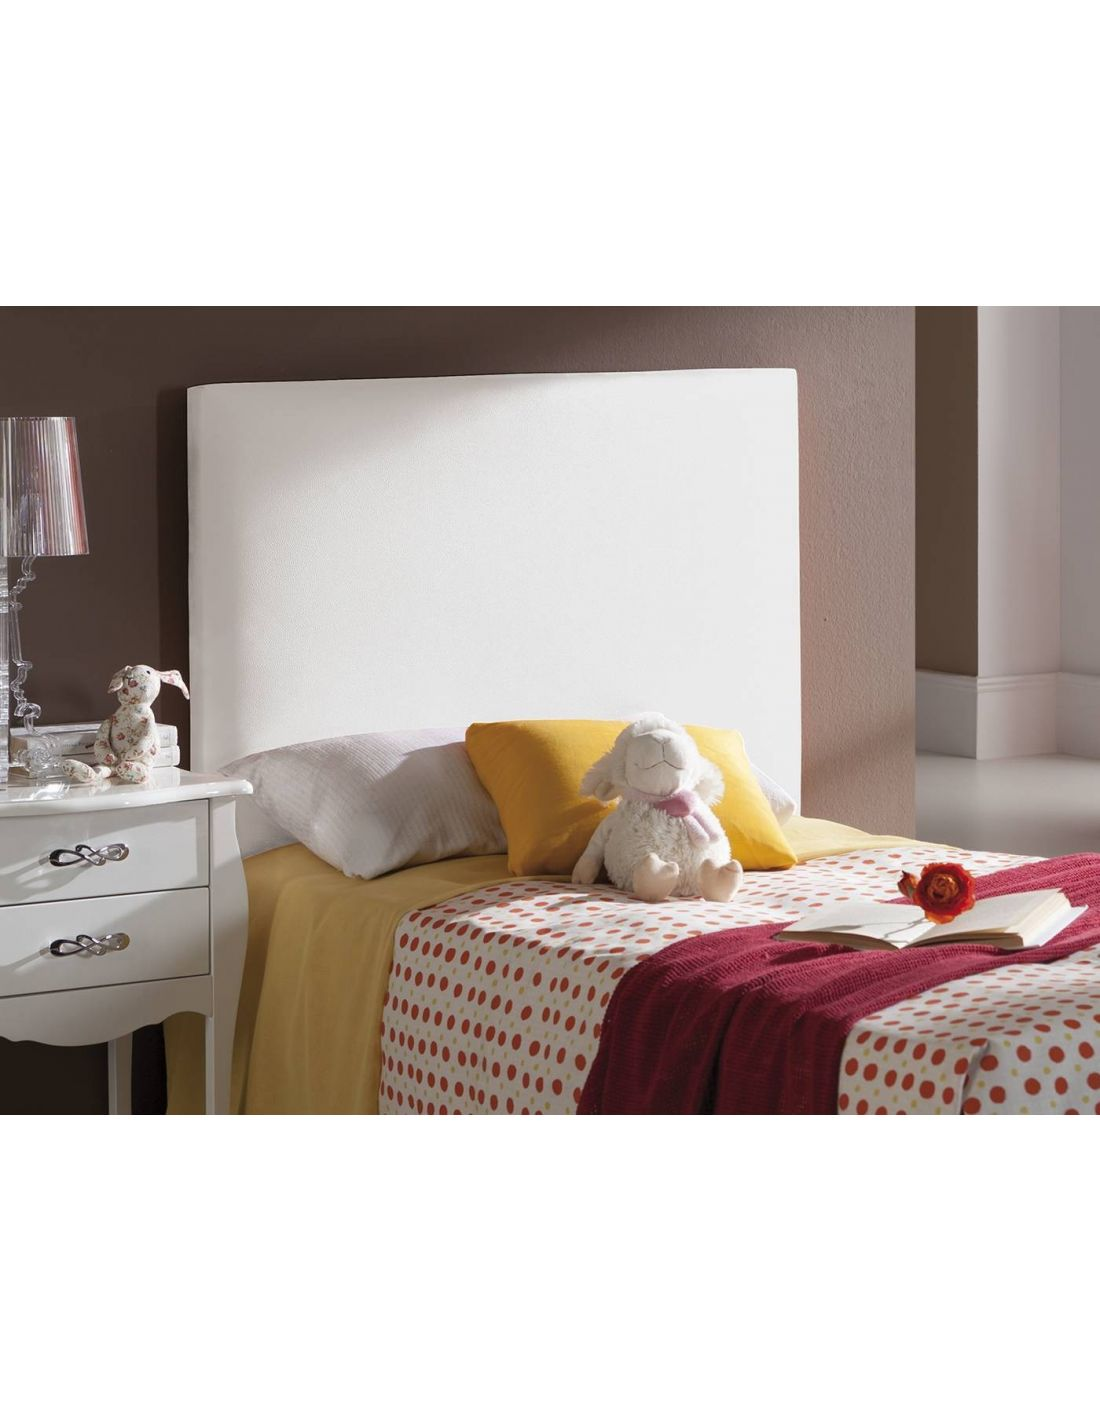 Cabeceros para dormitorios infantiles blanco rojo - Cabecero cama infantil ...